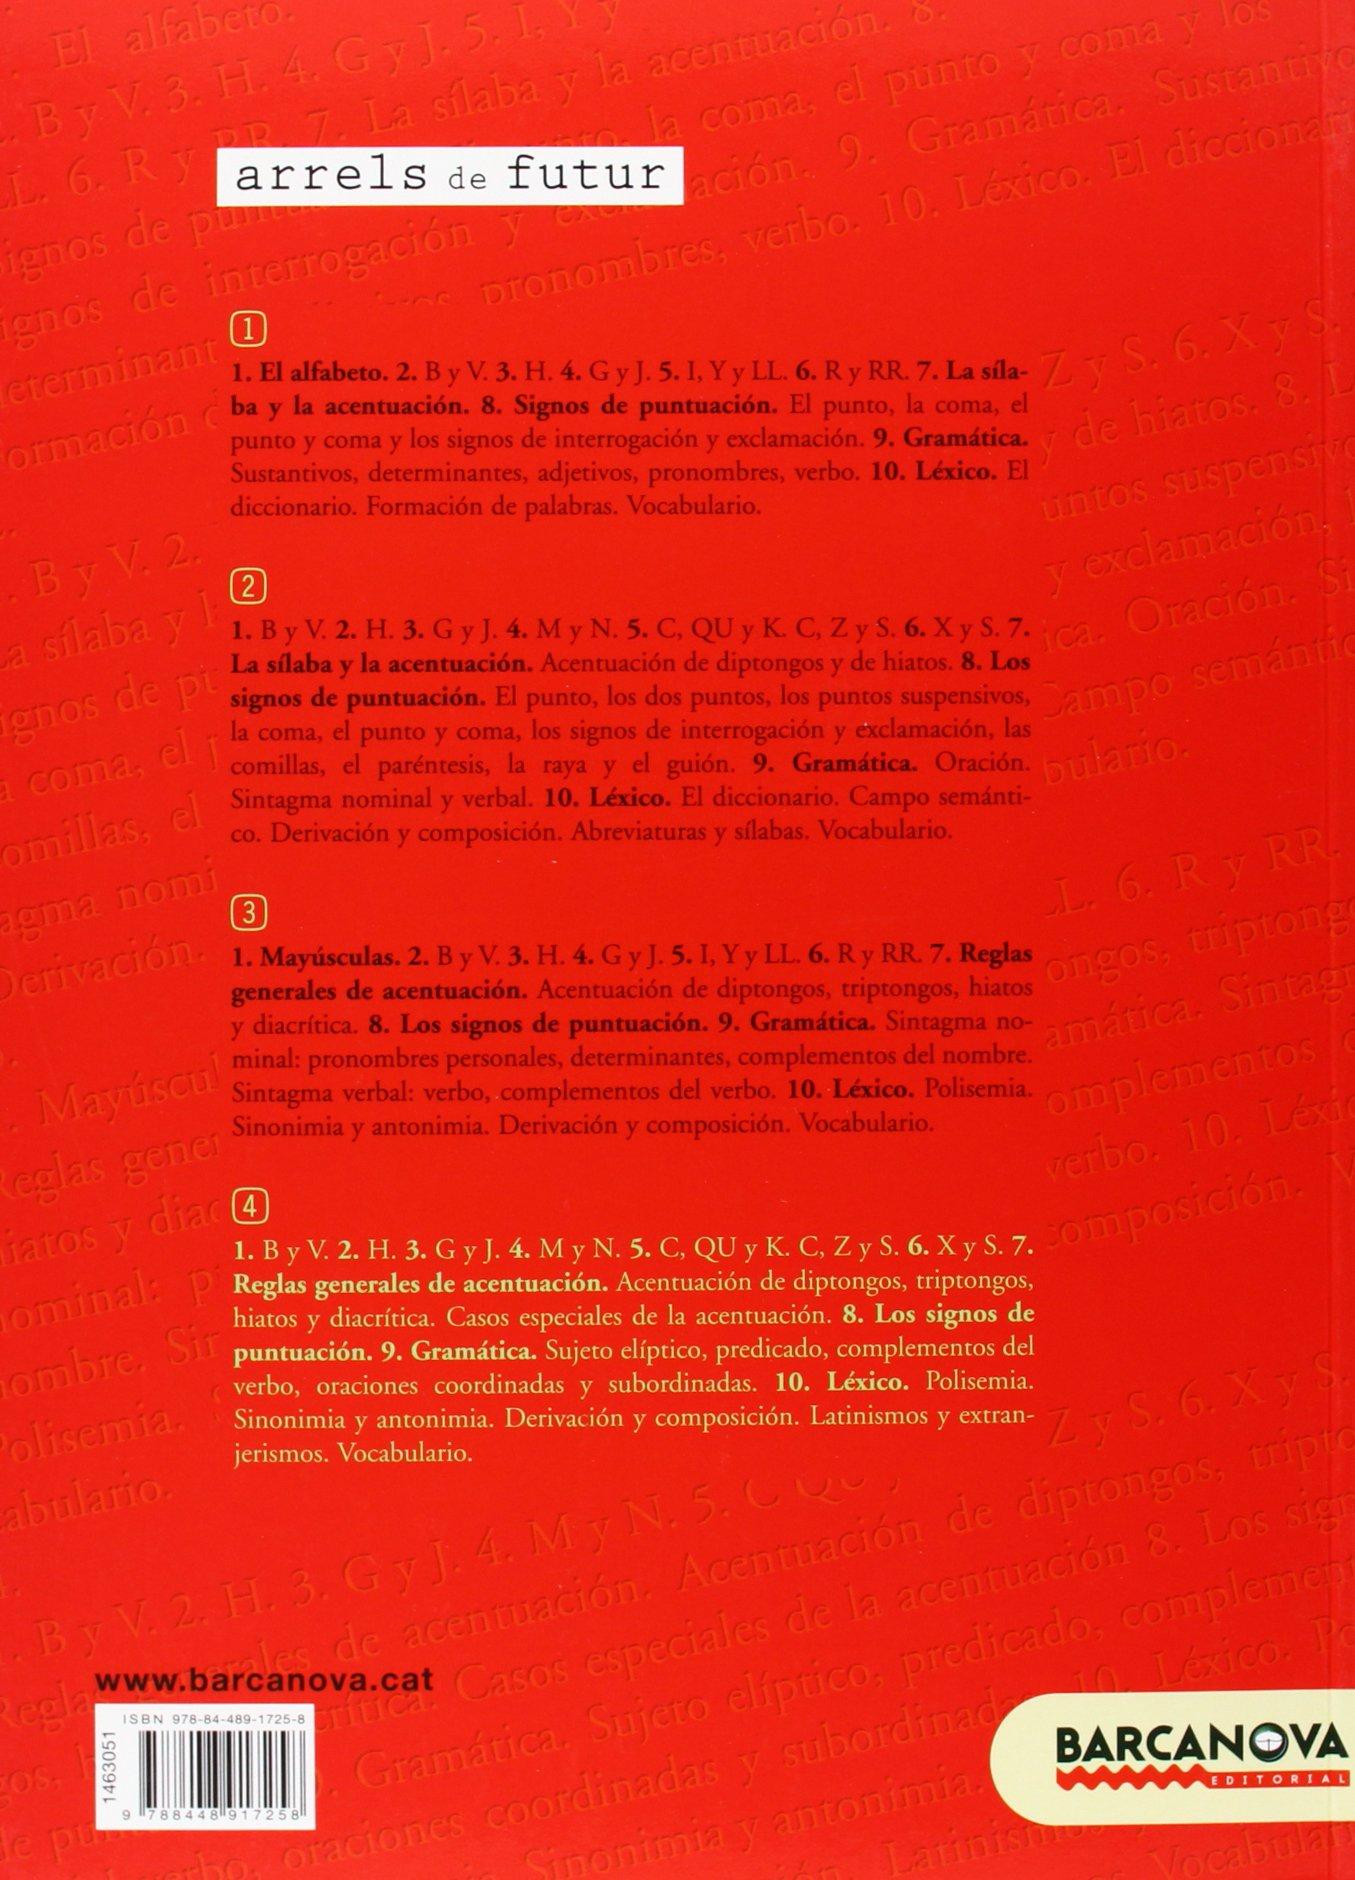 Lengua castellana, 4 ESO (Baleares, Cataluña). Cuaderno de refuerzo: Francisca Ezquerra Lezcano: 9788448917258: Amazon.com: Books